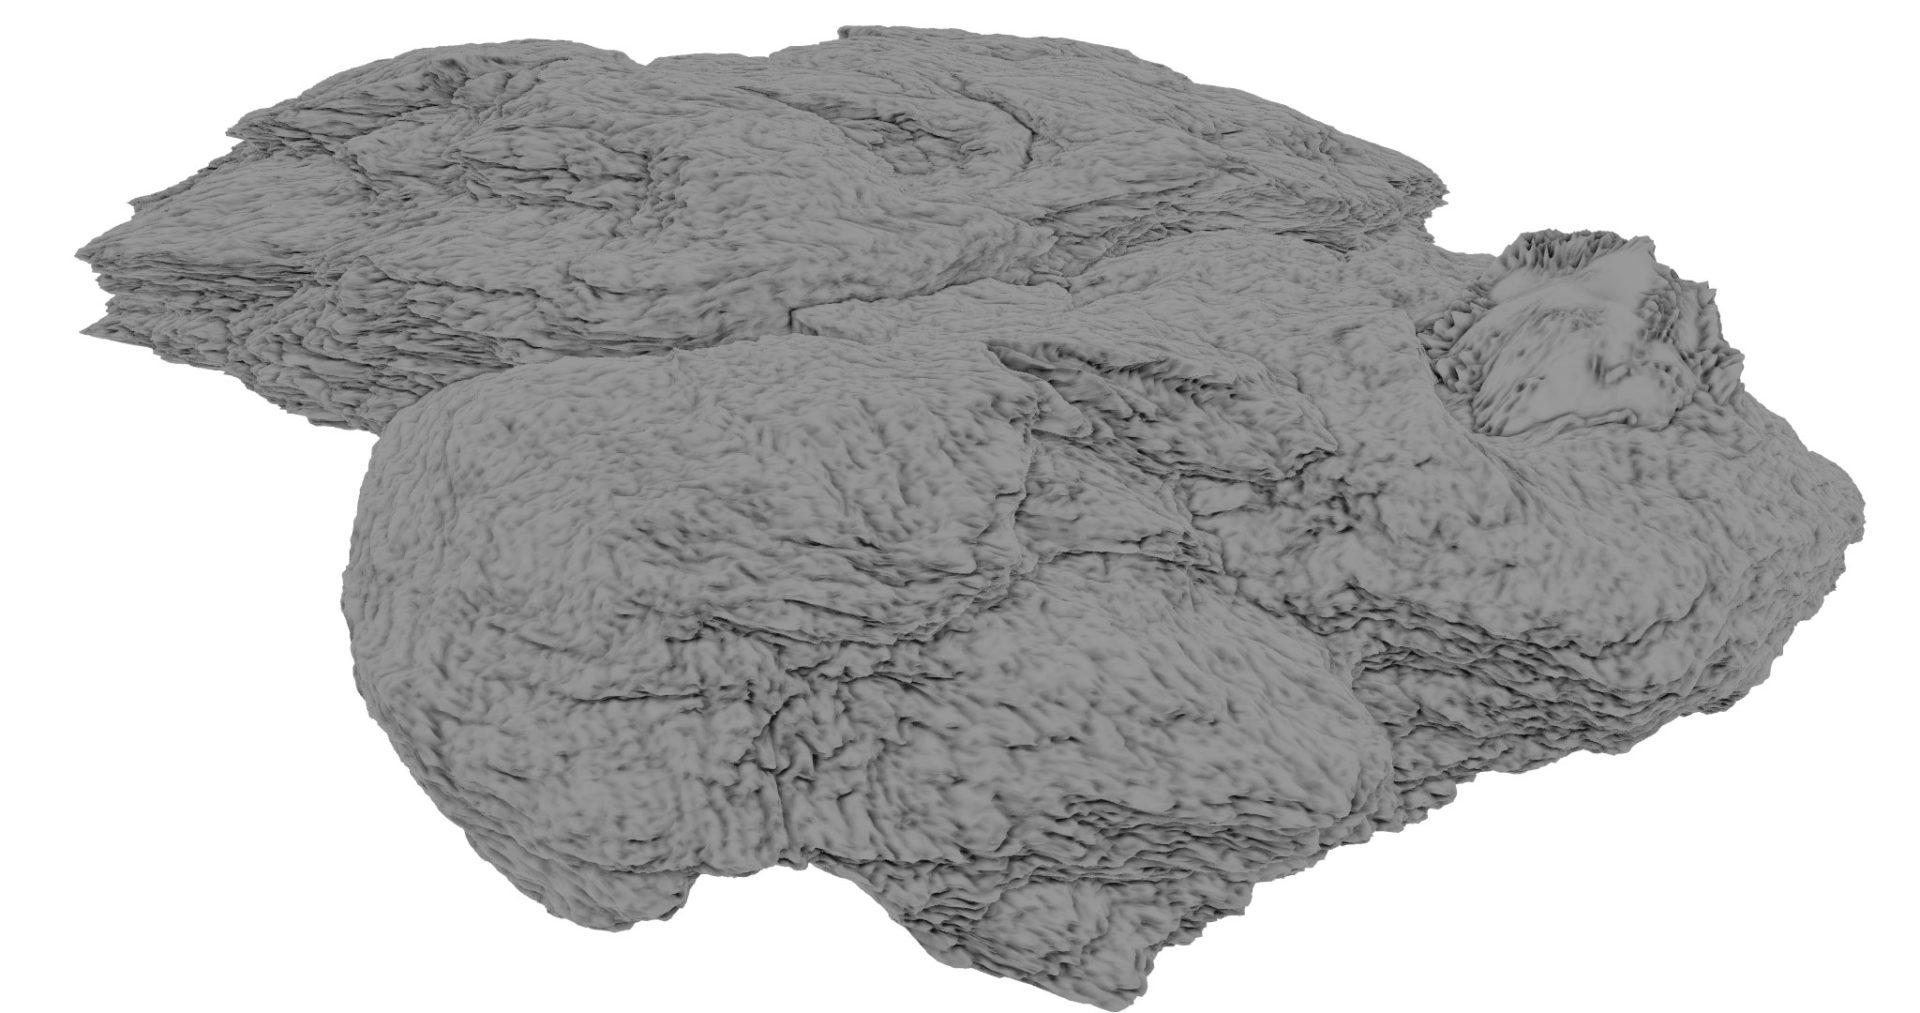 3D surface assets